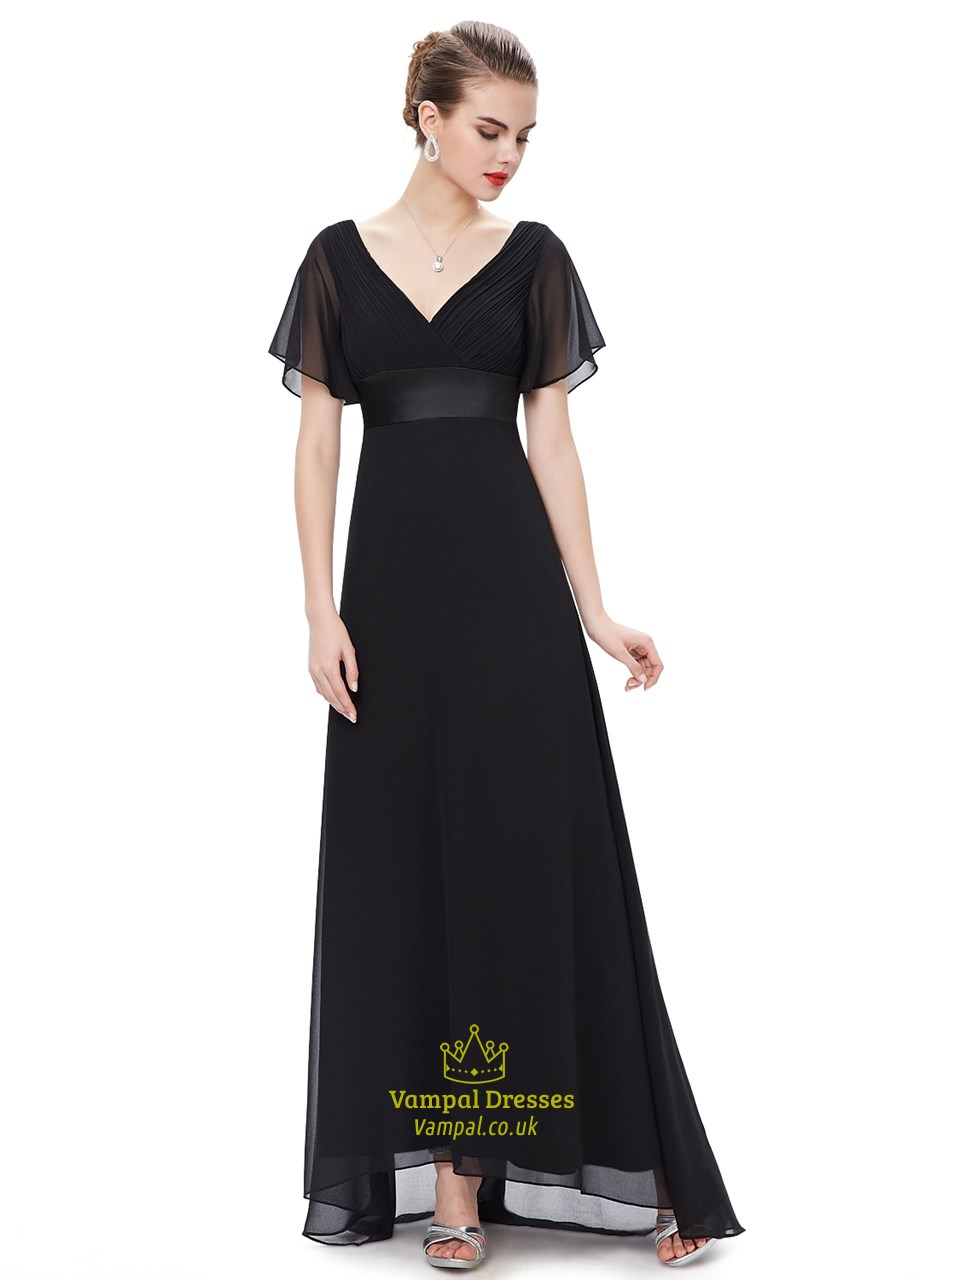 7937fbcf4a4 Black V Neck Chiffon Long Bridesmaid Dress With Flutter Sleeves SKU -NW1366